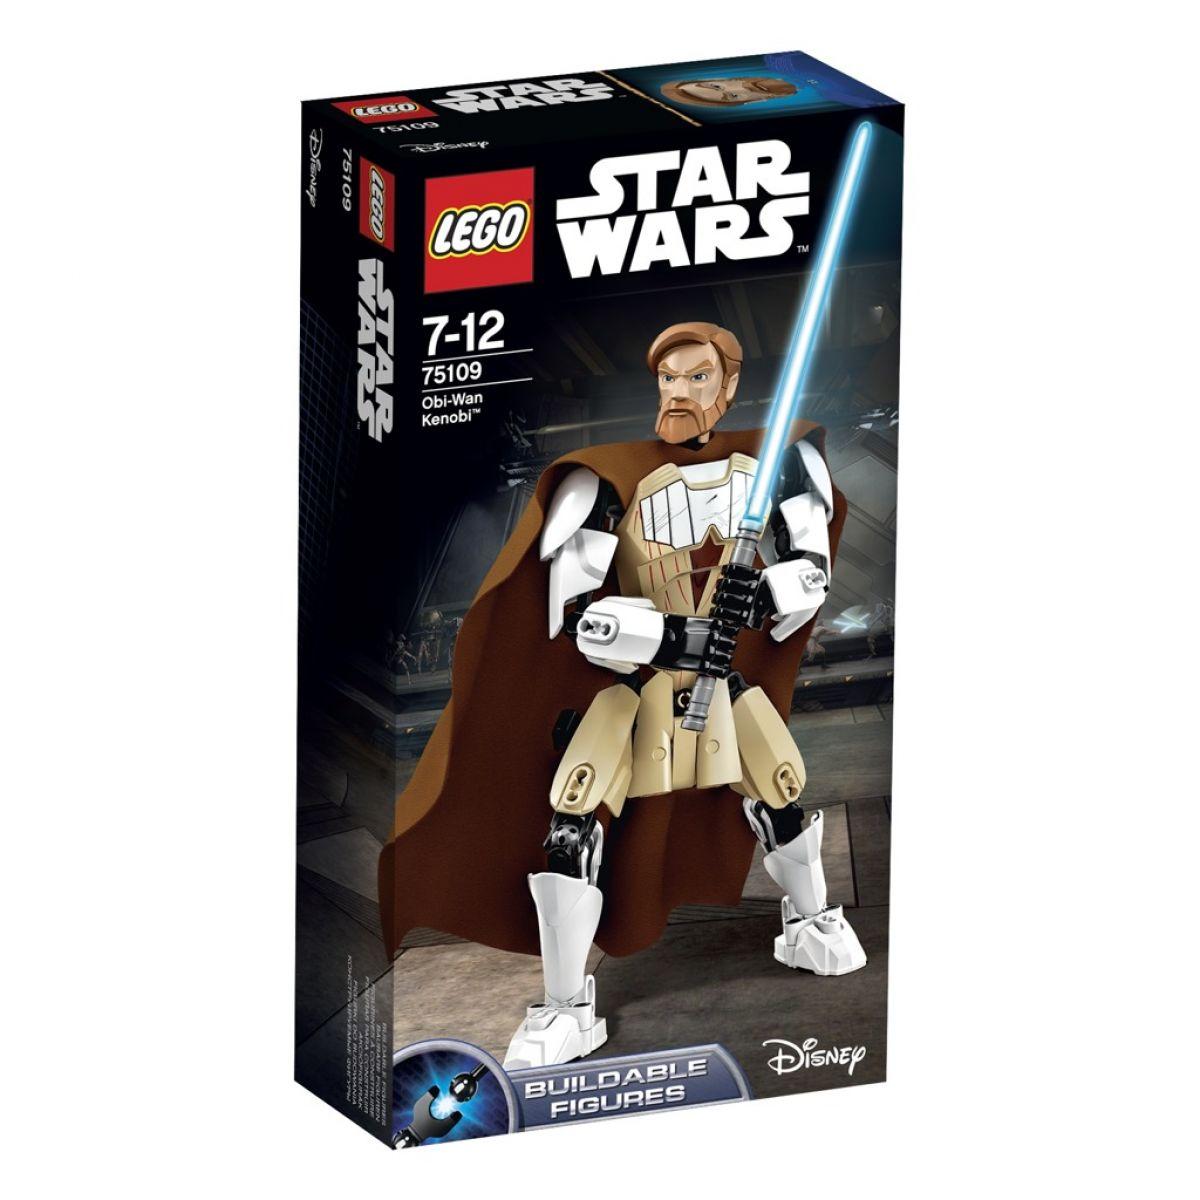 LEGO Star Wars 75109 Obi-wan Kenobi™